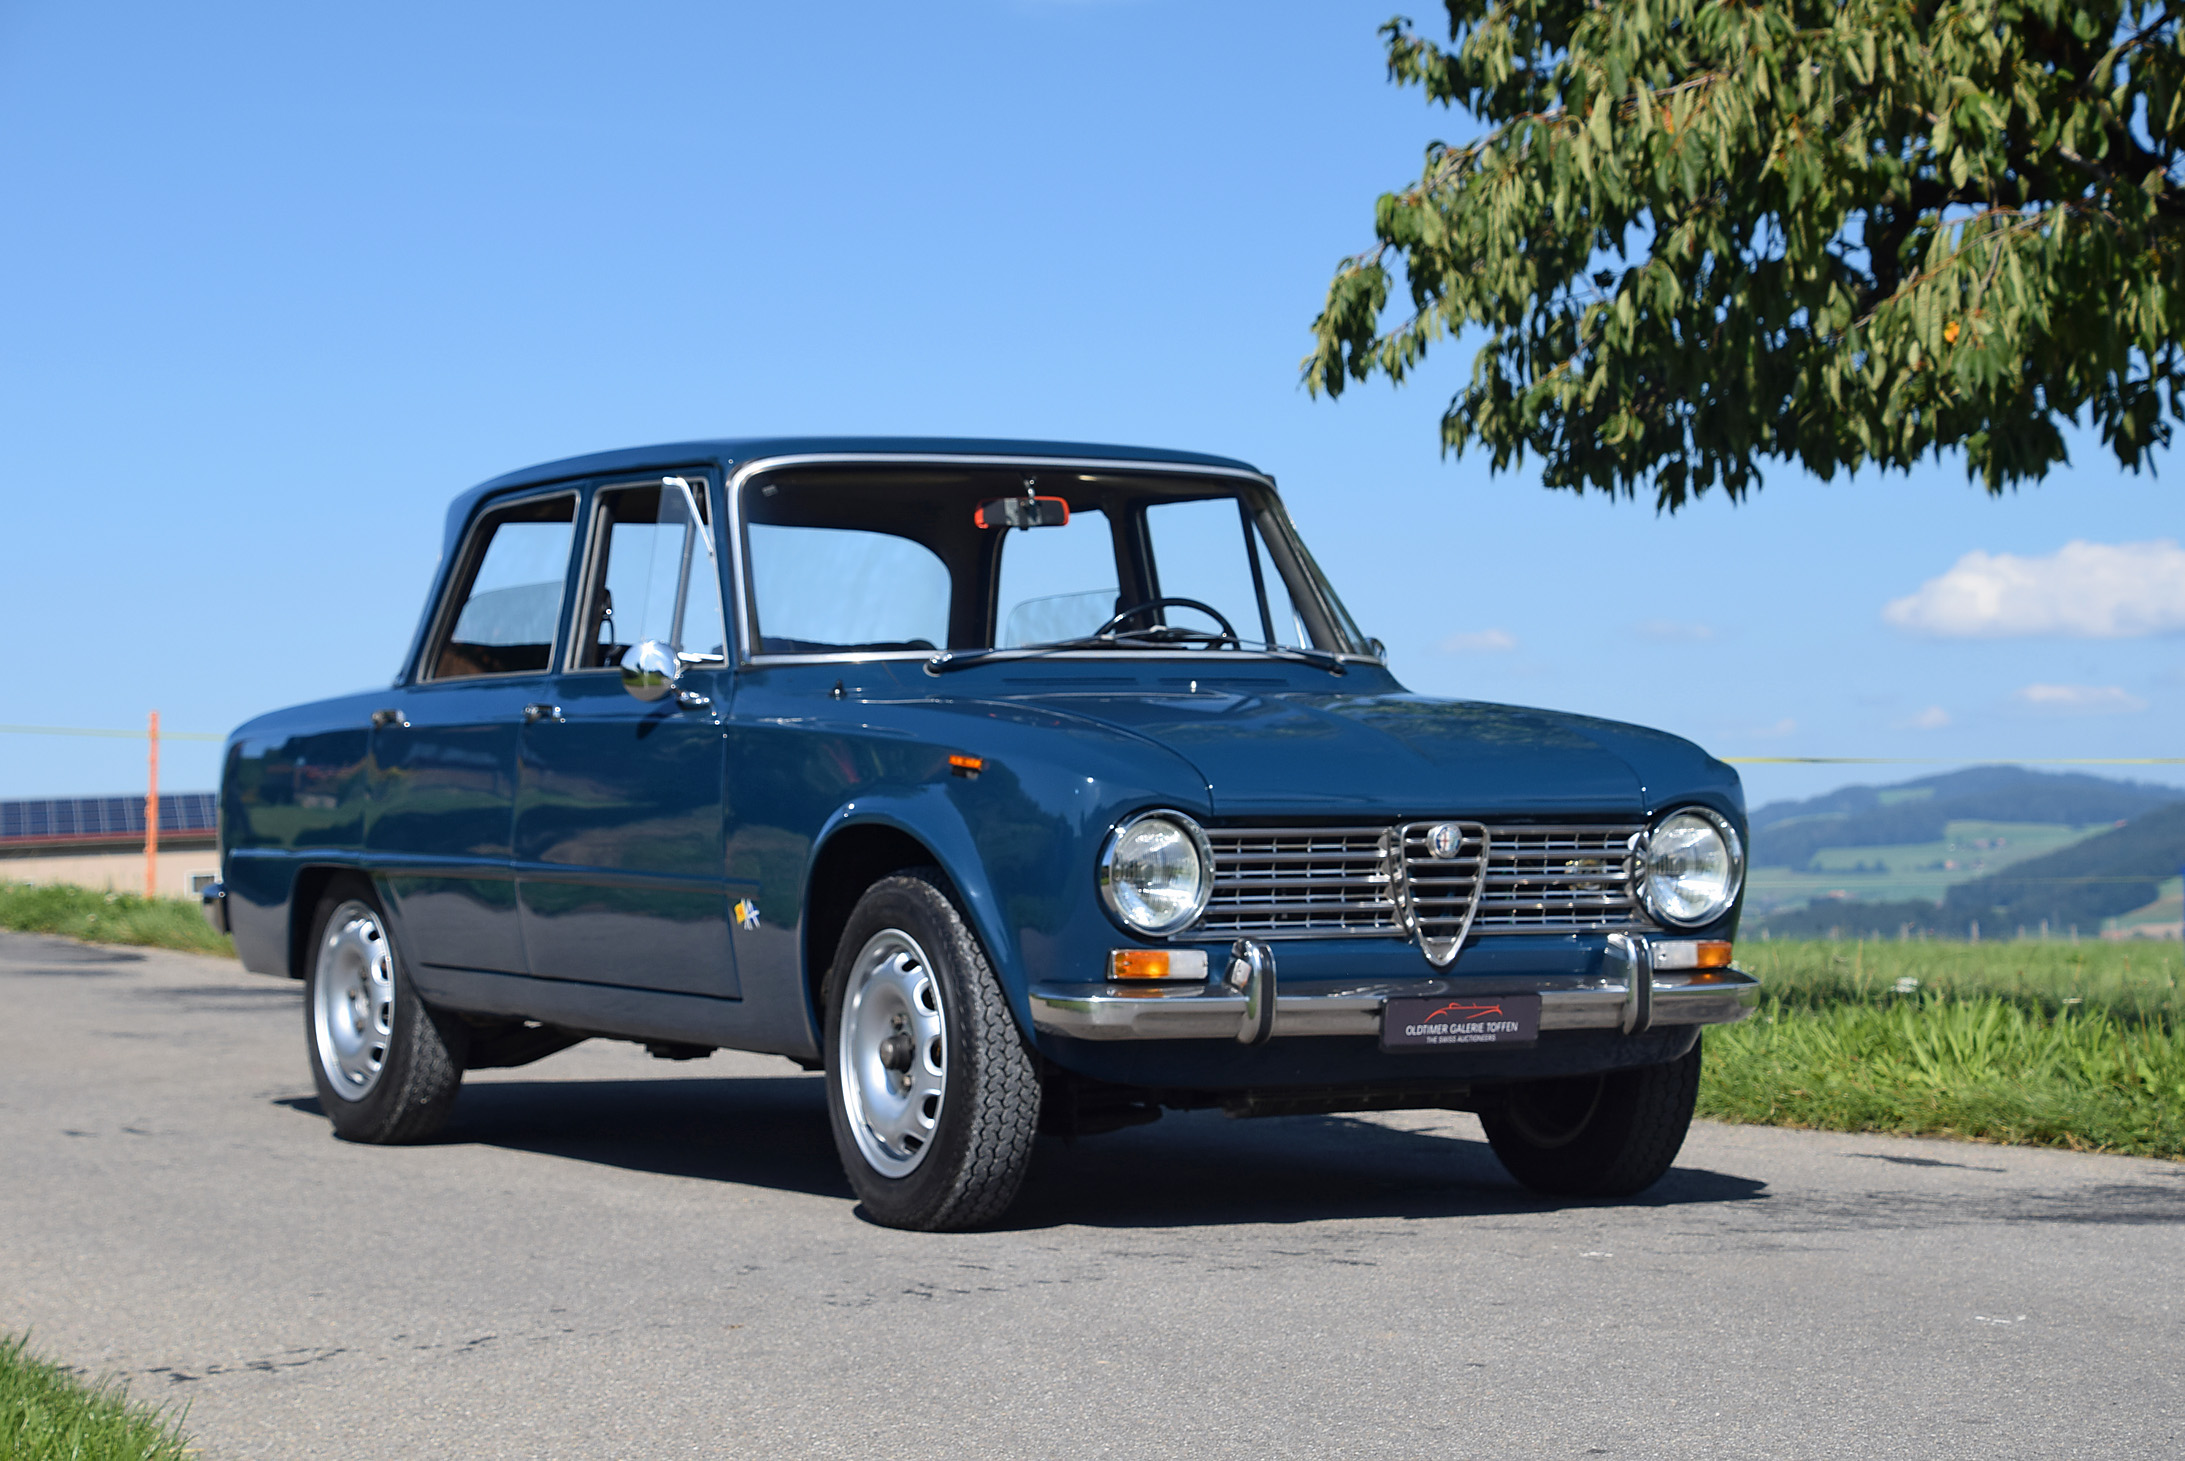 Alfa Romeo Giulia 1300 1966 Oldtimer Galerie Toffen asta